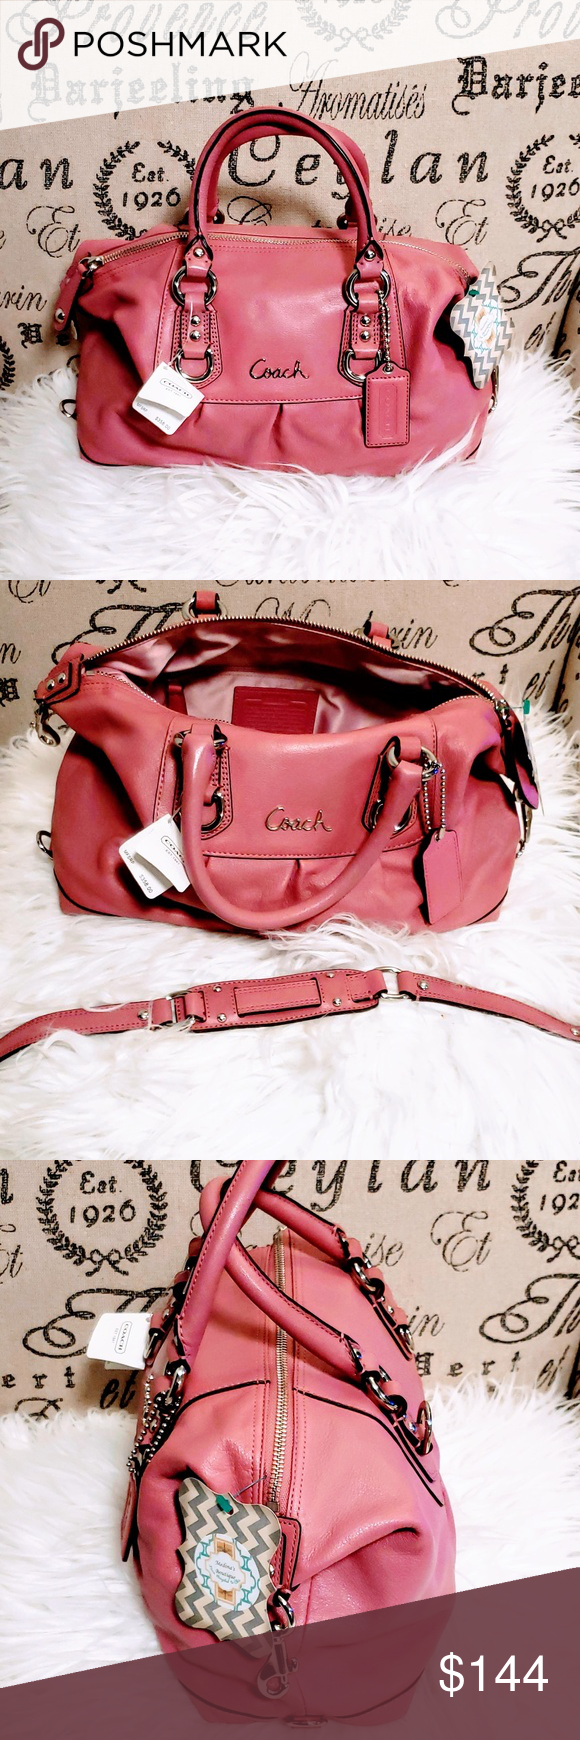 4edaebf585 Coach Ashley leather satchel purse Dusty Rose🆕💋 Brand New with tags Coach